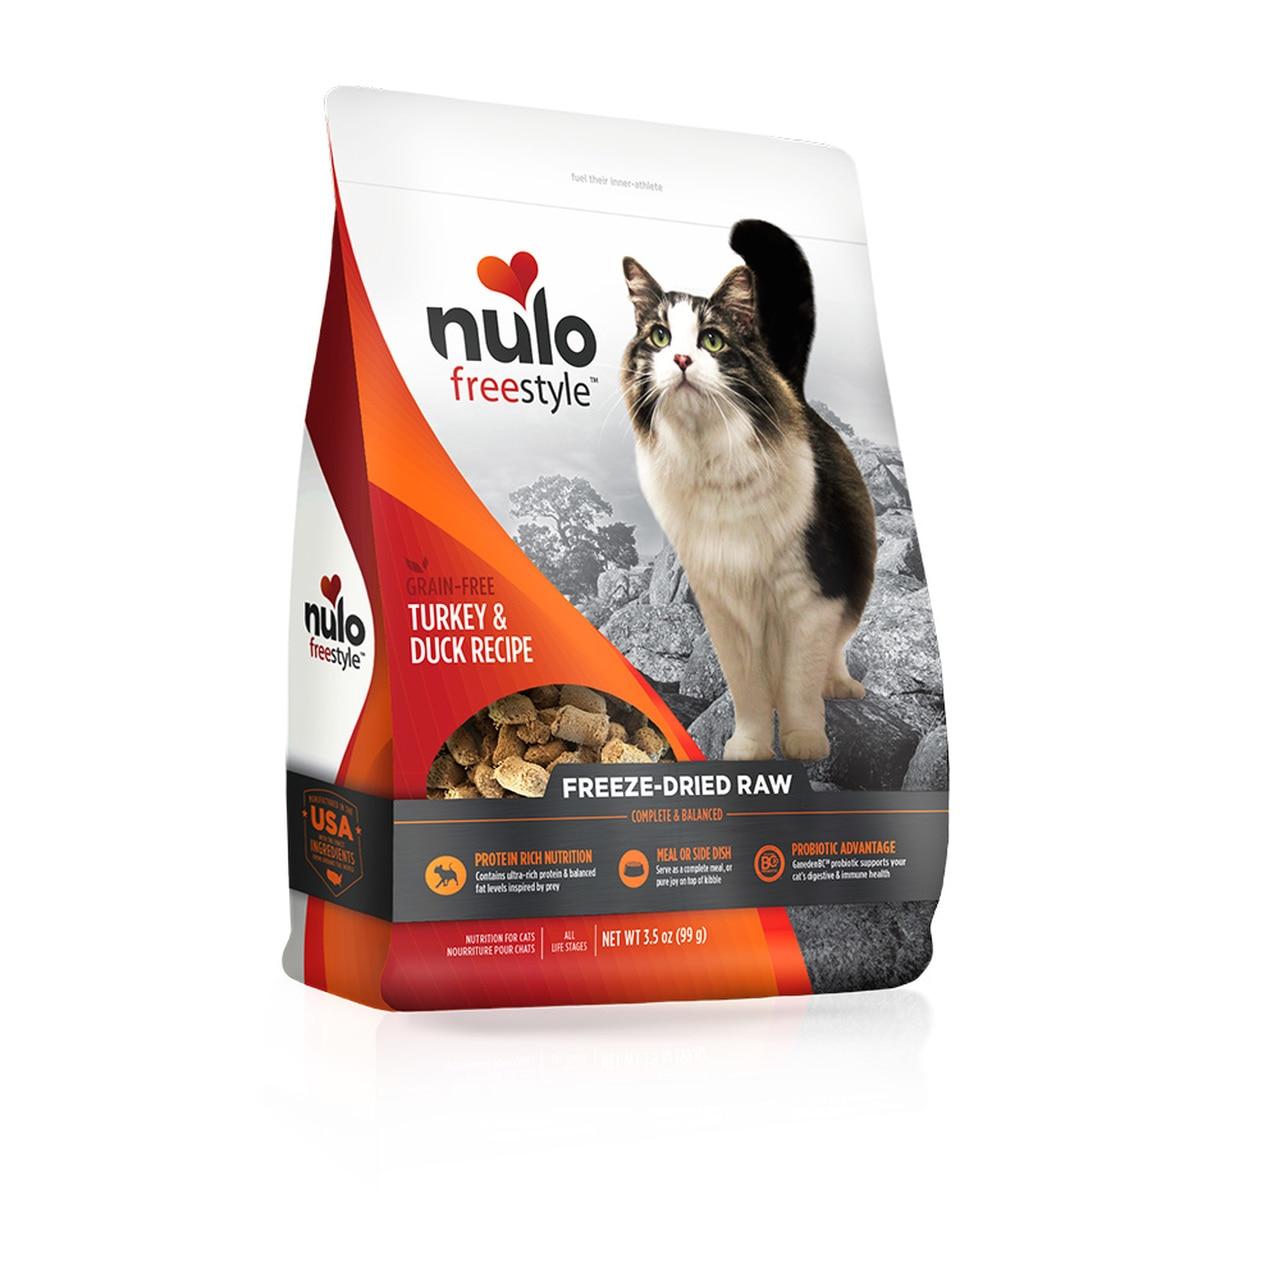 Nulo Freestyle Turkey & Duck Freeze-Dried Raw Cat Food Image